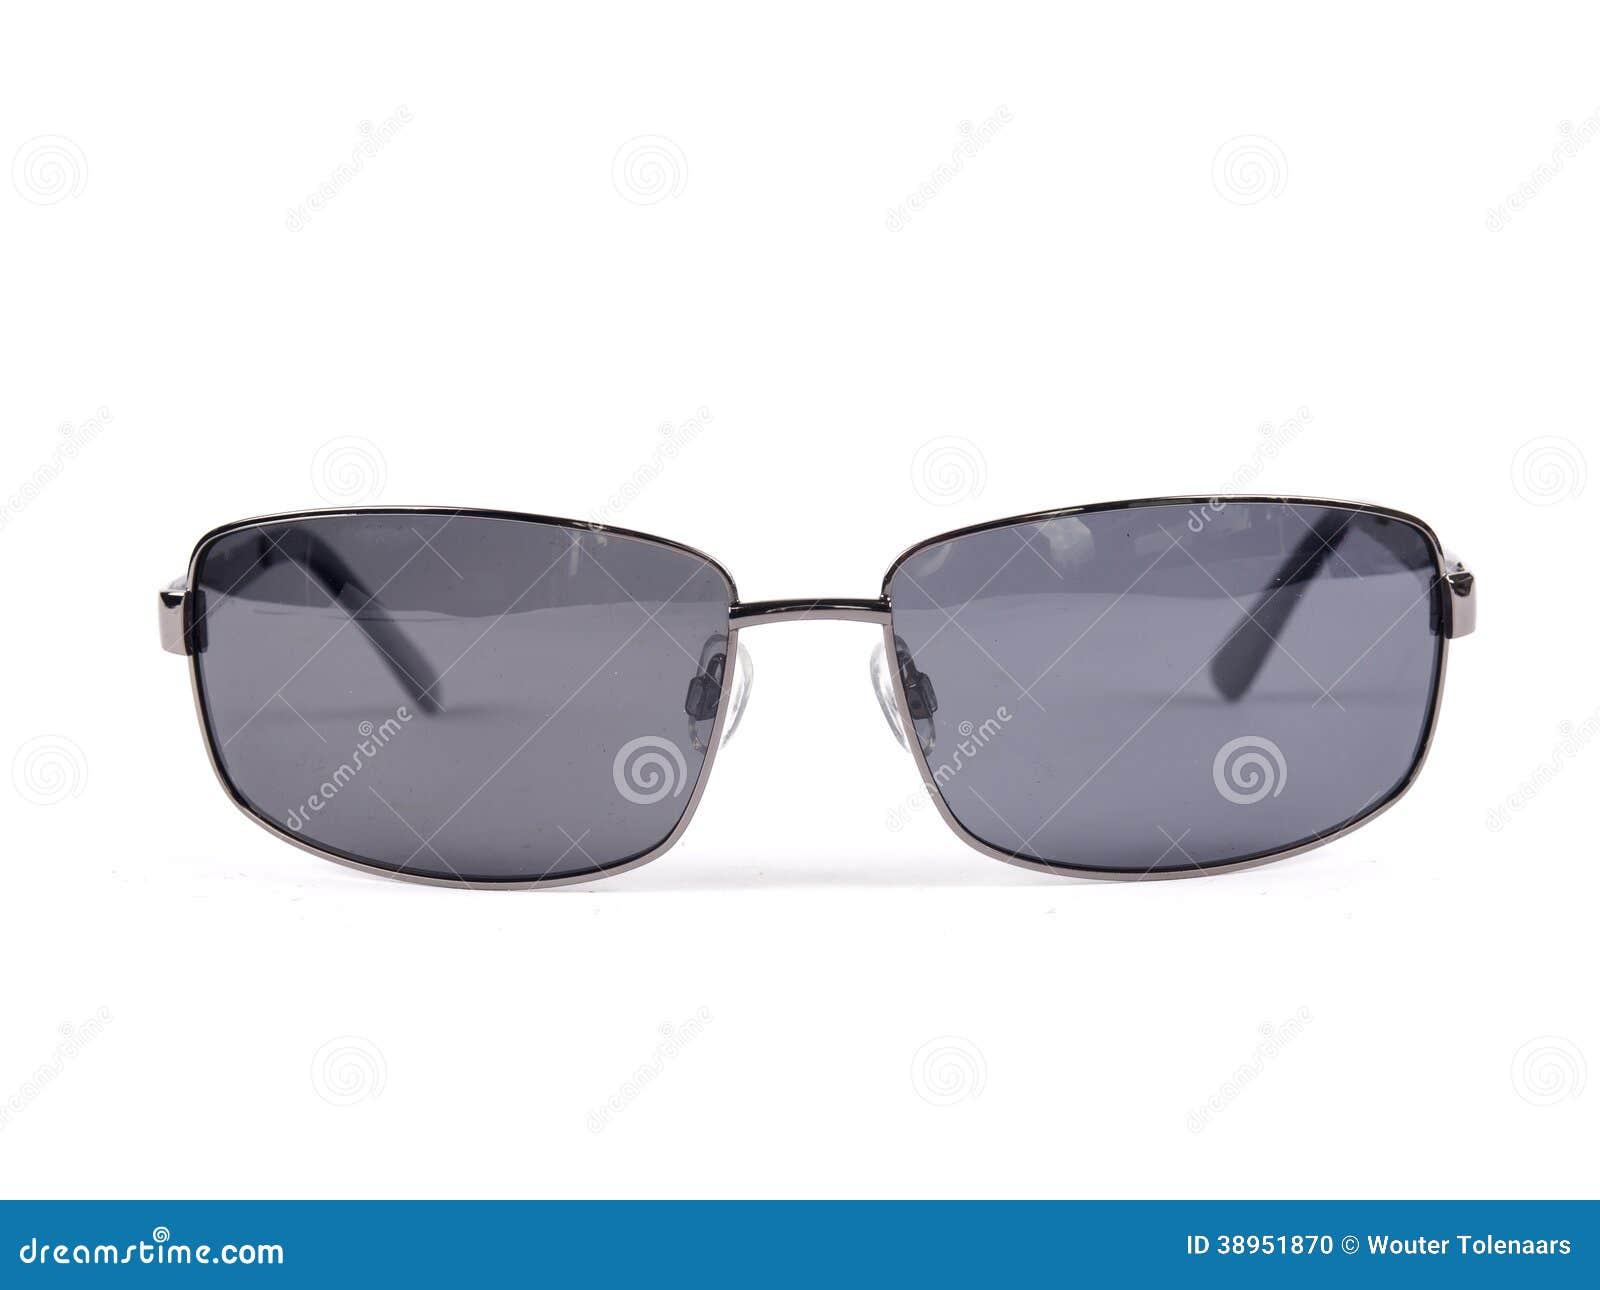 95ebcd1a42cbf Gafas De Sol Tipo Aviador Negras Foto de archivo - Imagen de ...